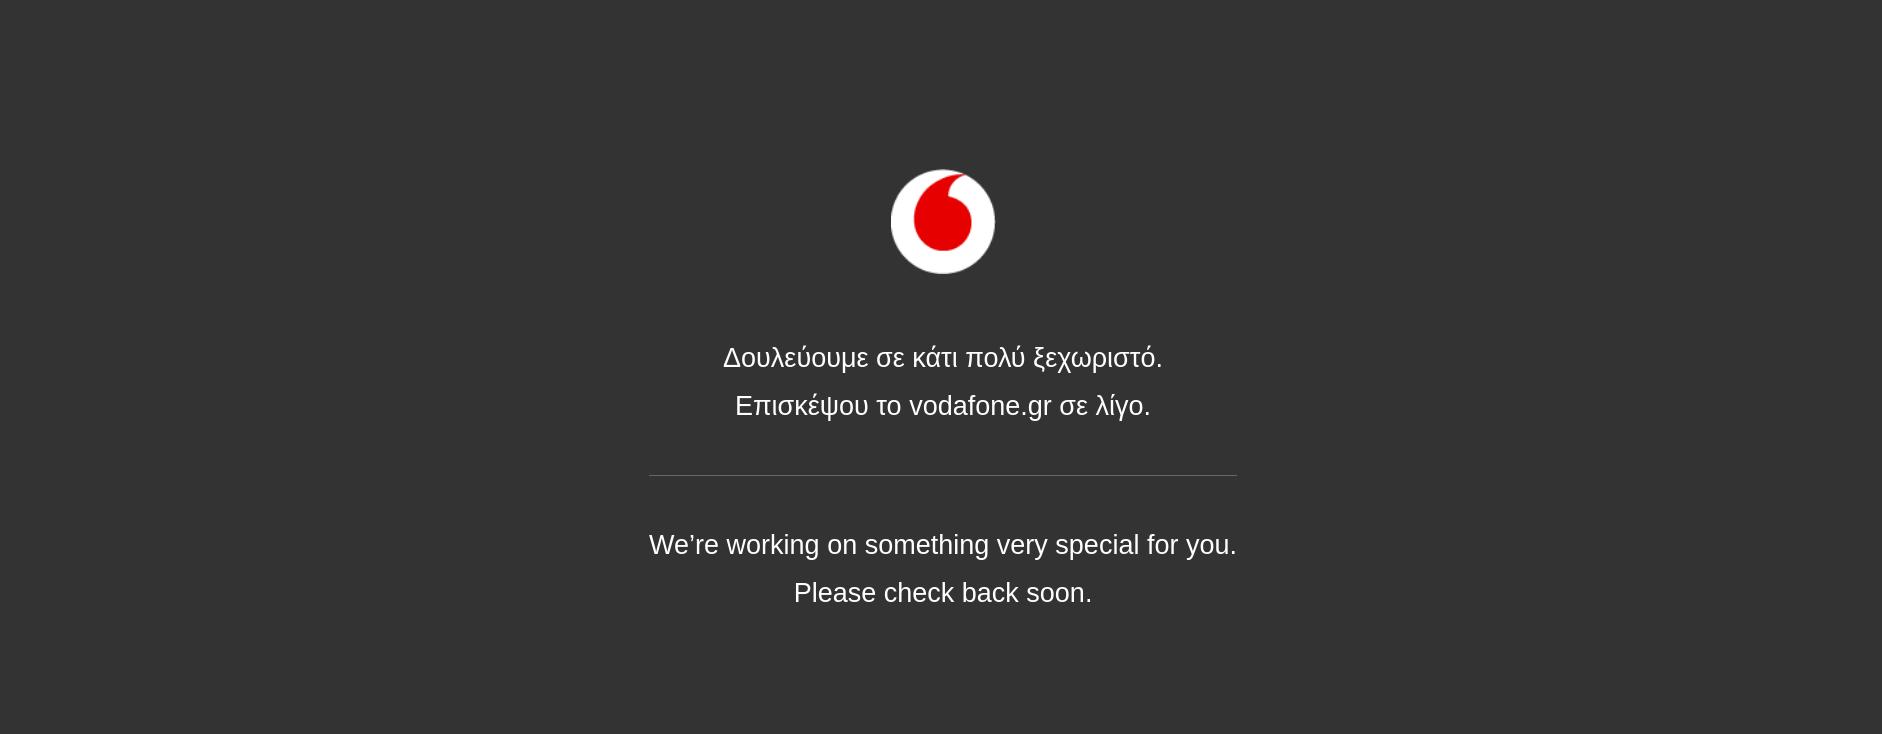 Screenshot 2020 09 30 18 08 46 - Vodafone general downtime